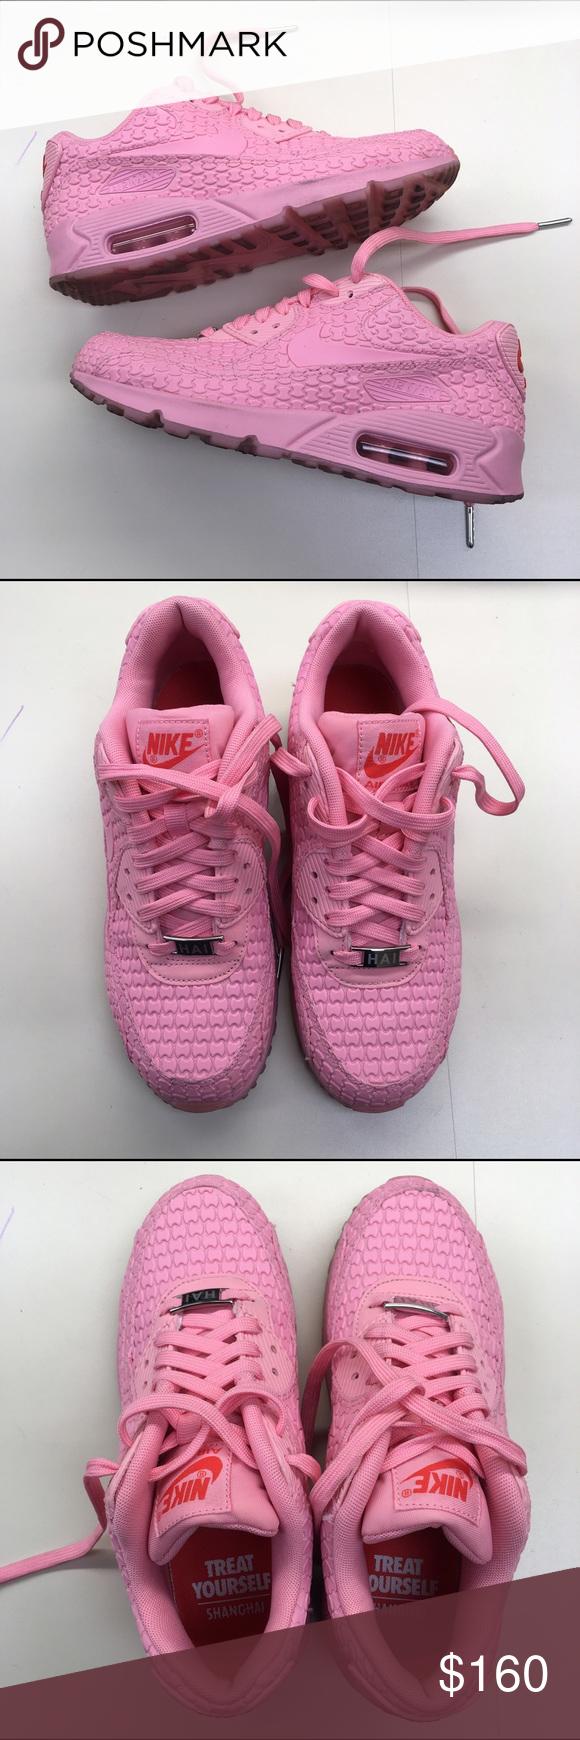 2dc46b975e47 denmark rare women nike pink light grey air max 90 premium em weaving shoes  for versatile 5ed21 ab175  italy rare nike air max 90 shanghai worn twice.